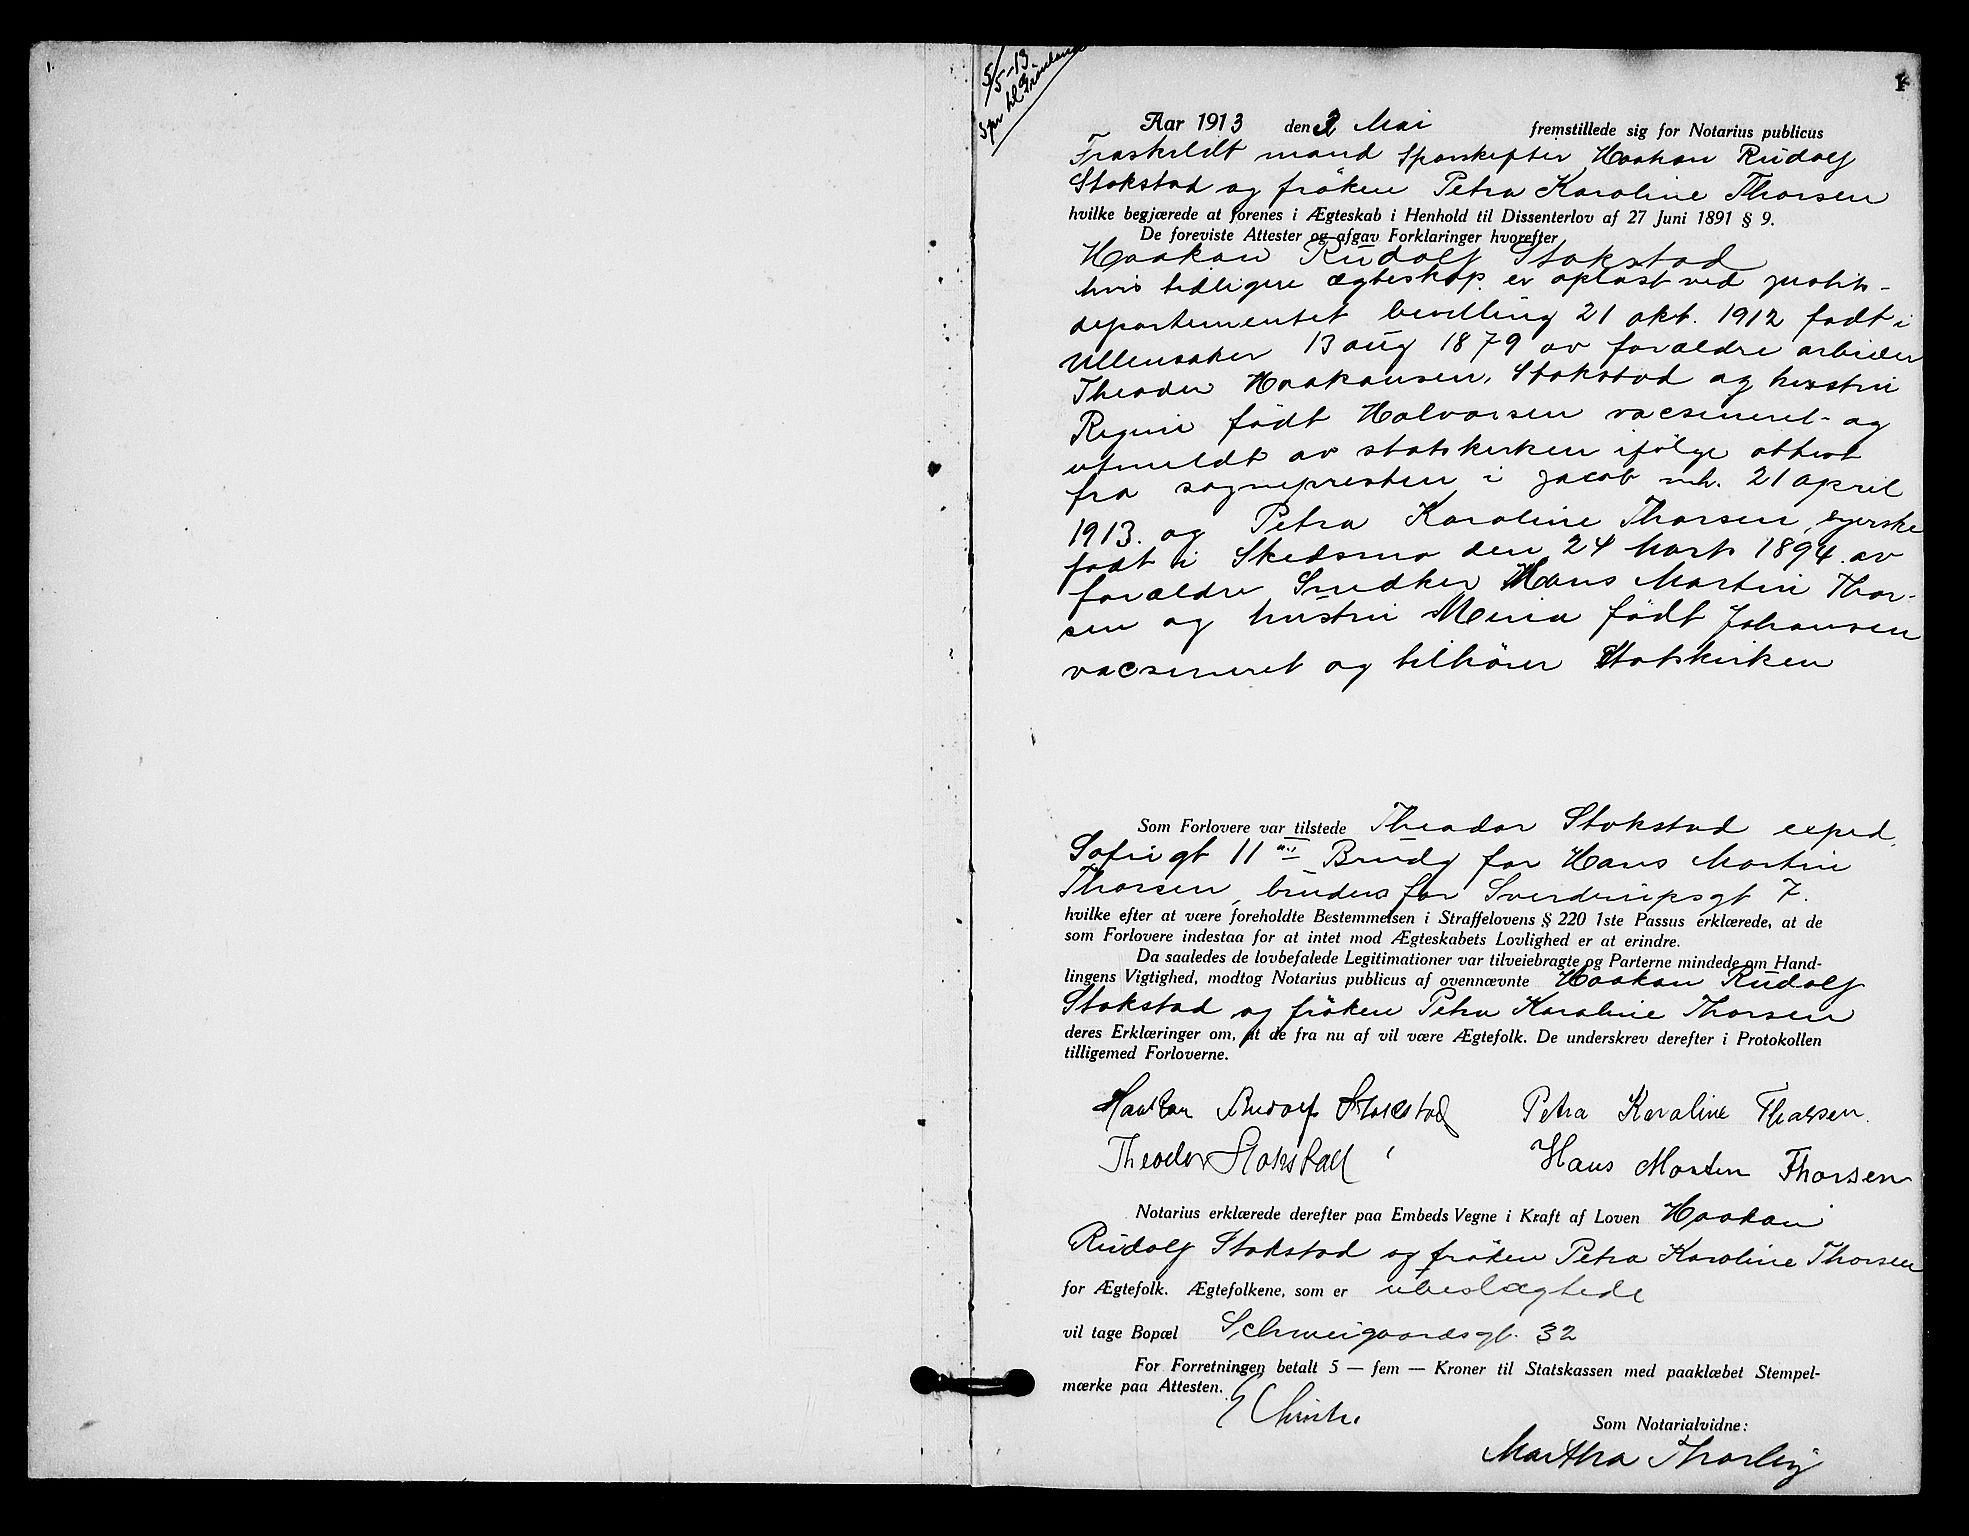 SAO, Oslo byfogd avd. I, L/Lb/Lbb/L0009: Notarialprotokoll, rekke II: Vigsler, 1913-1914, s. 1a